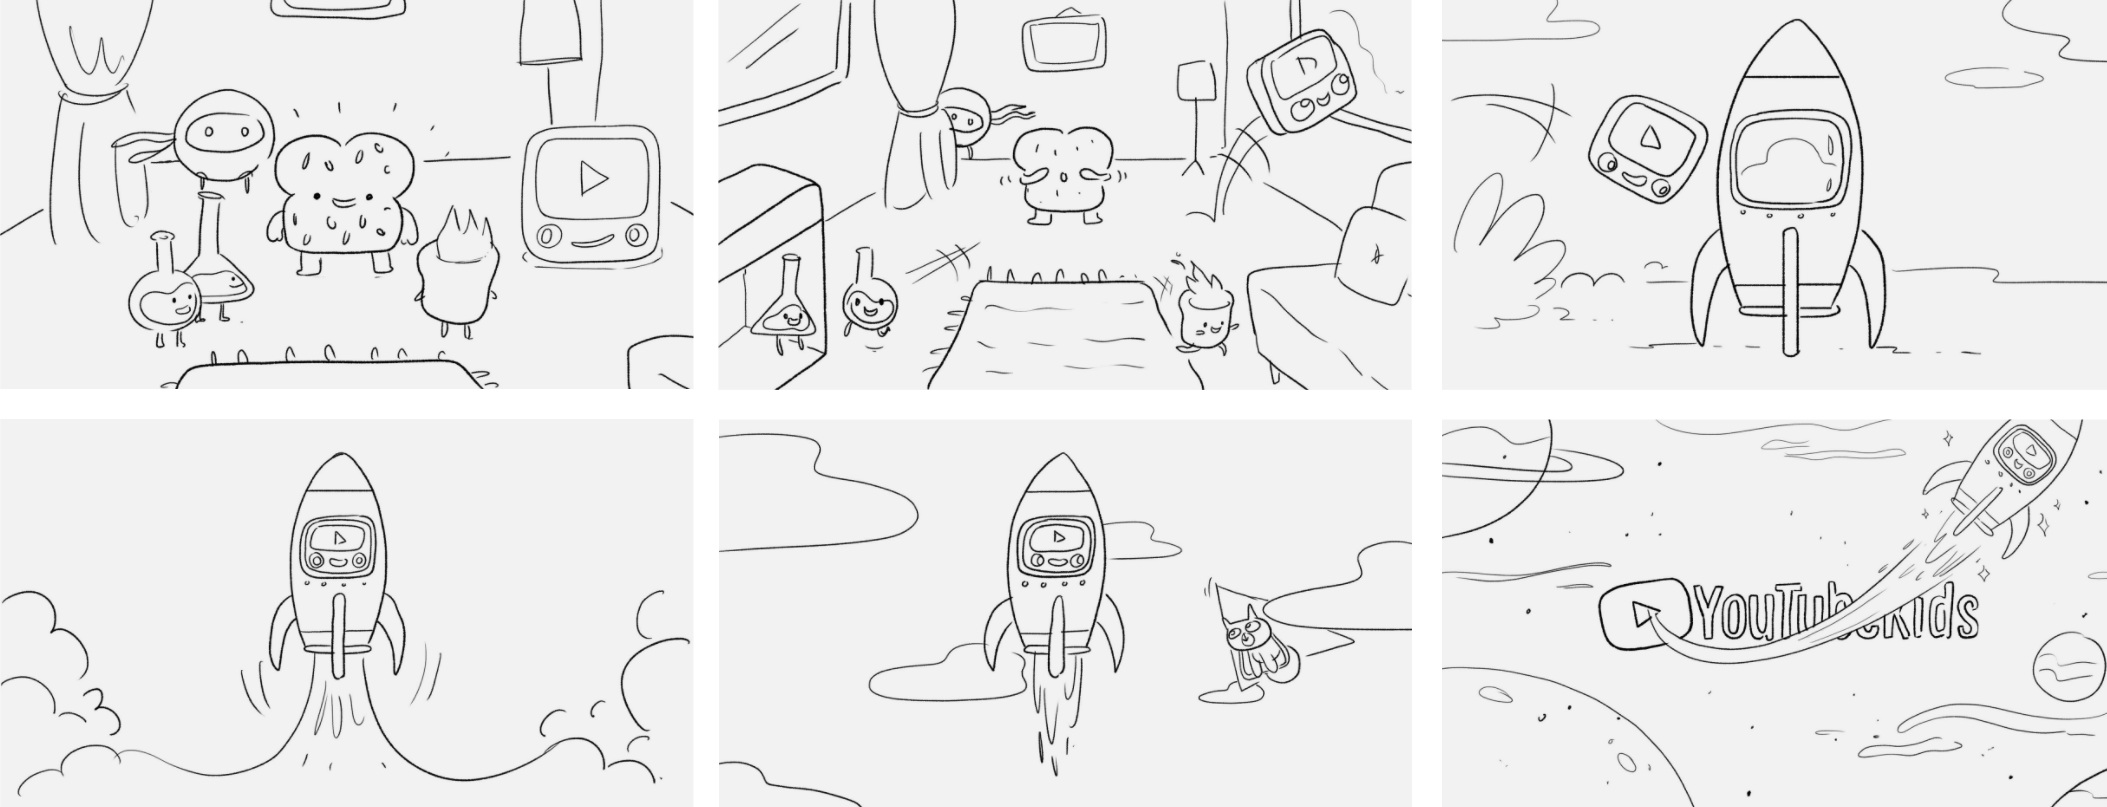 storyboards+01.jpg